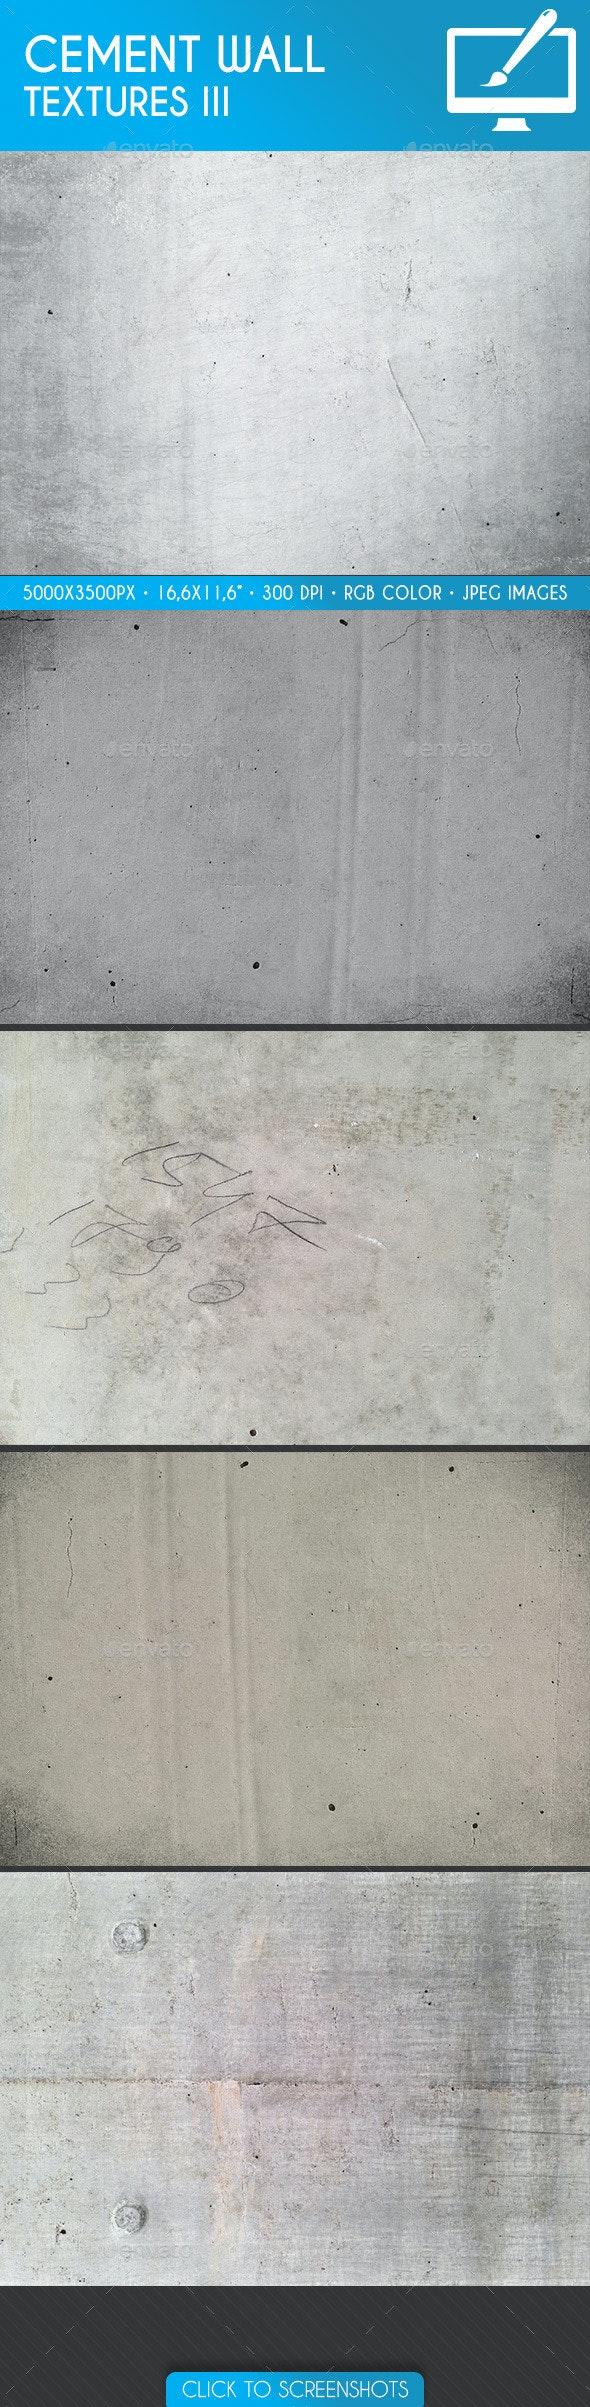 Cement Wall Backgrounds/Textures III - Textures